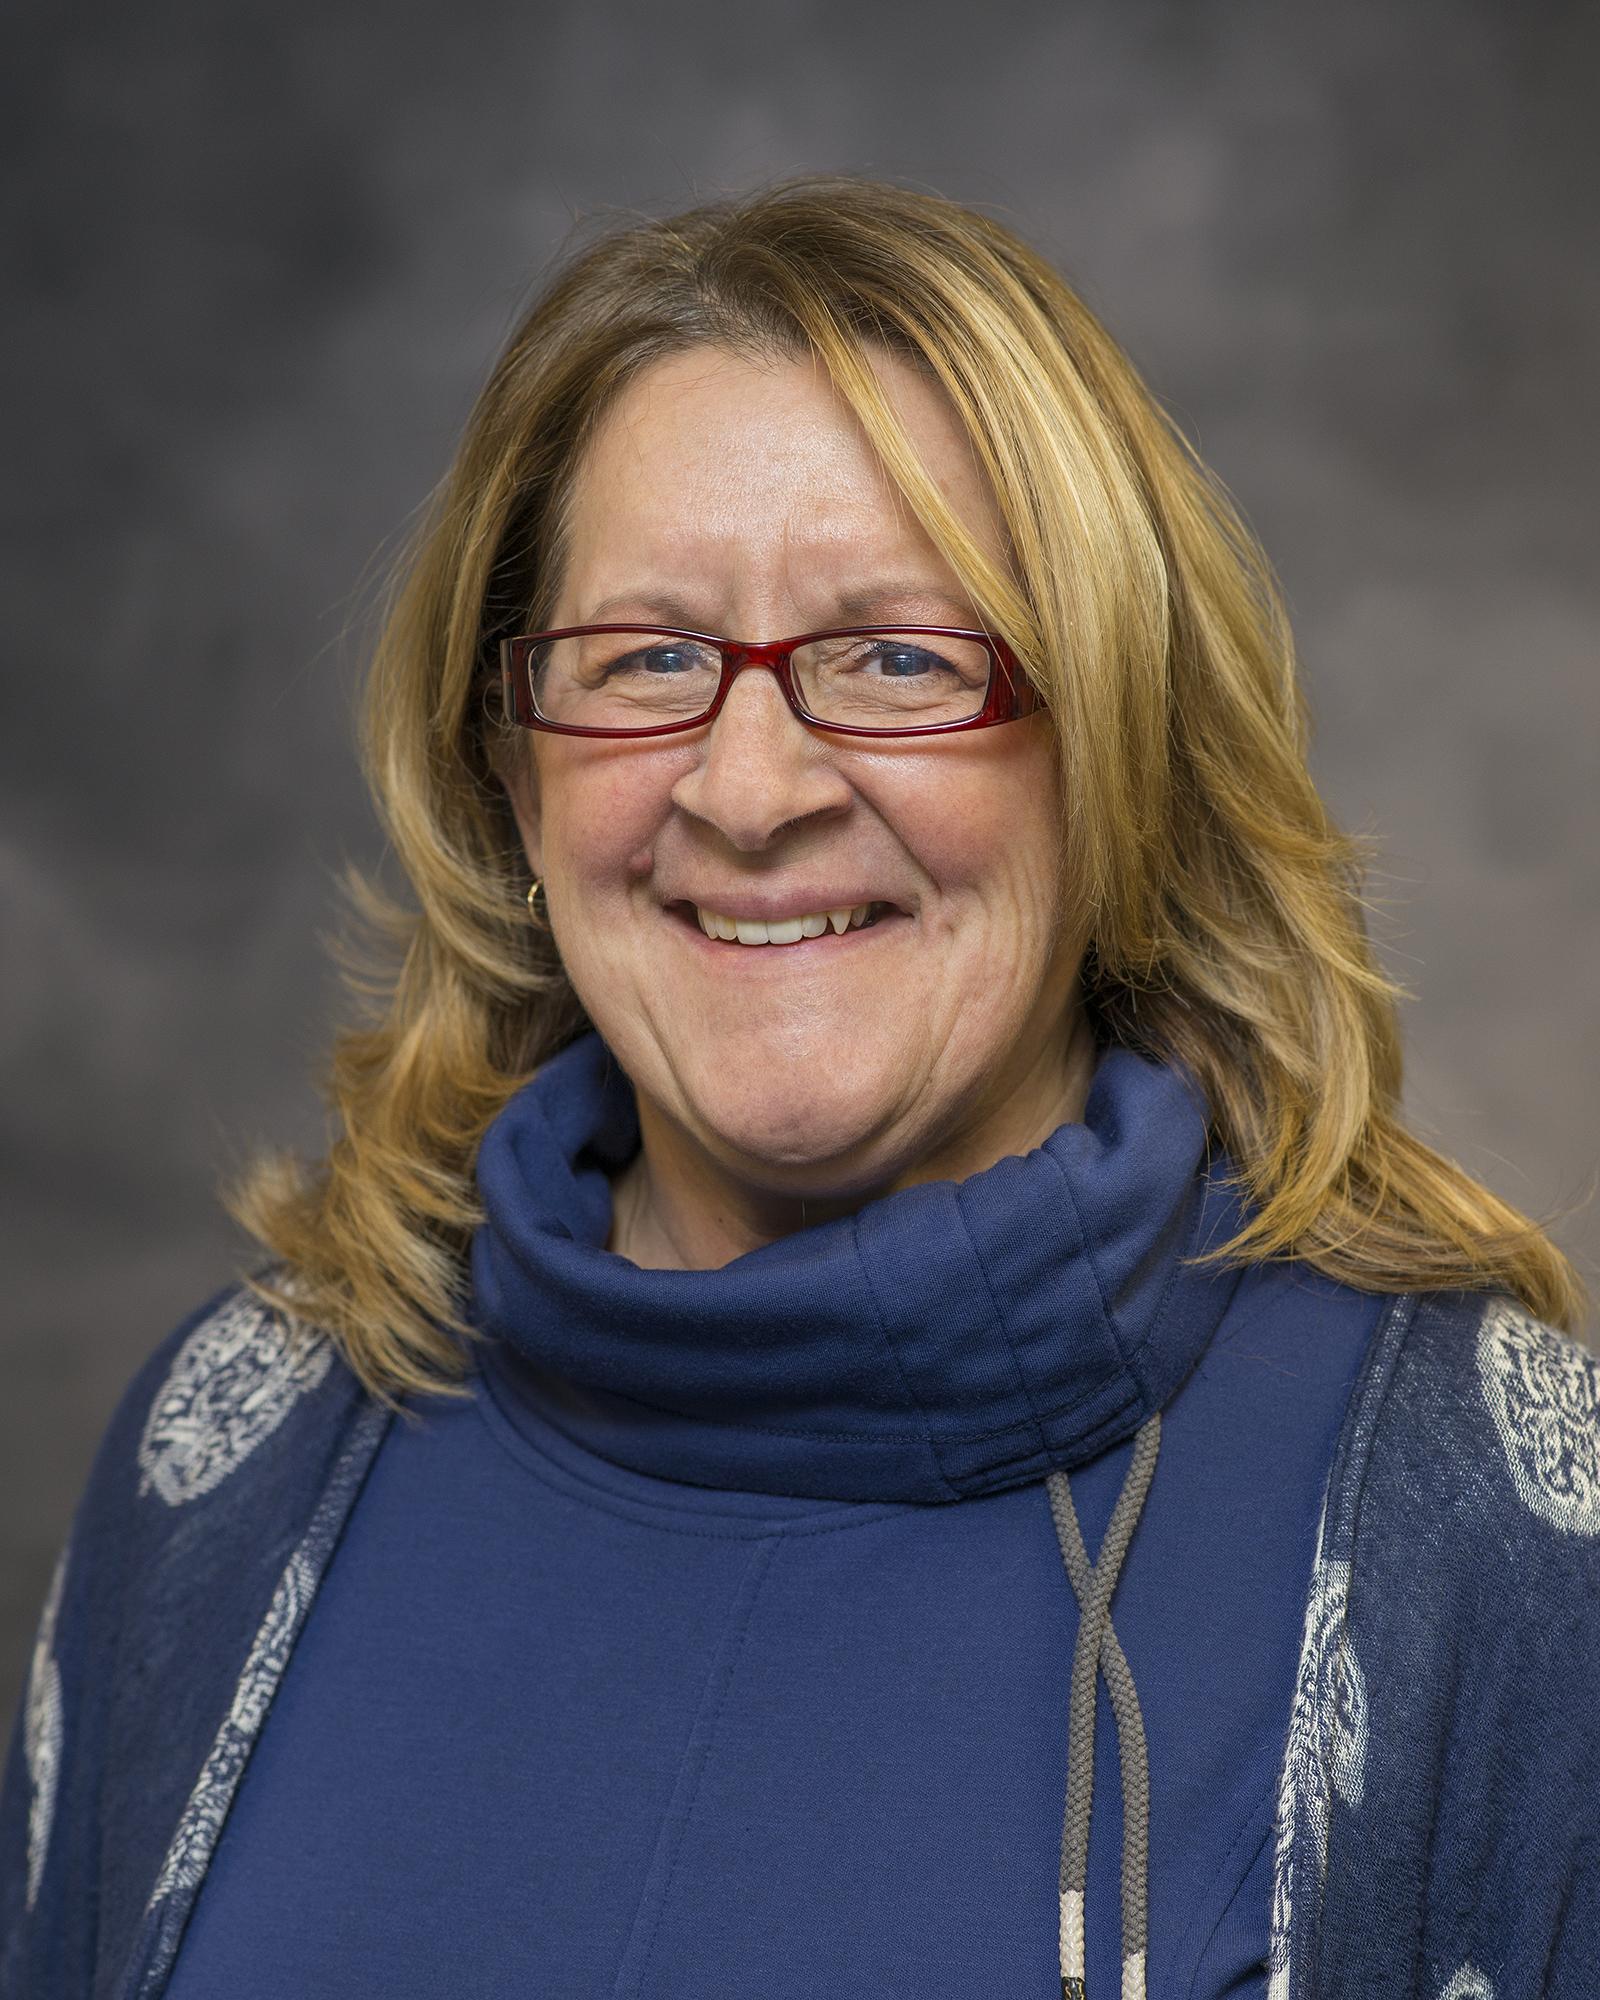 Grahl Center Director Shari Deevers